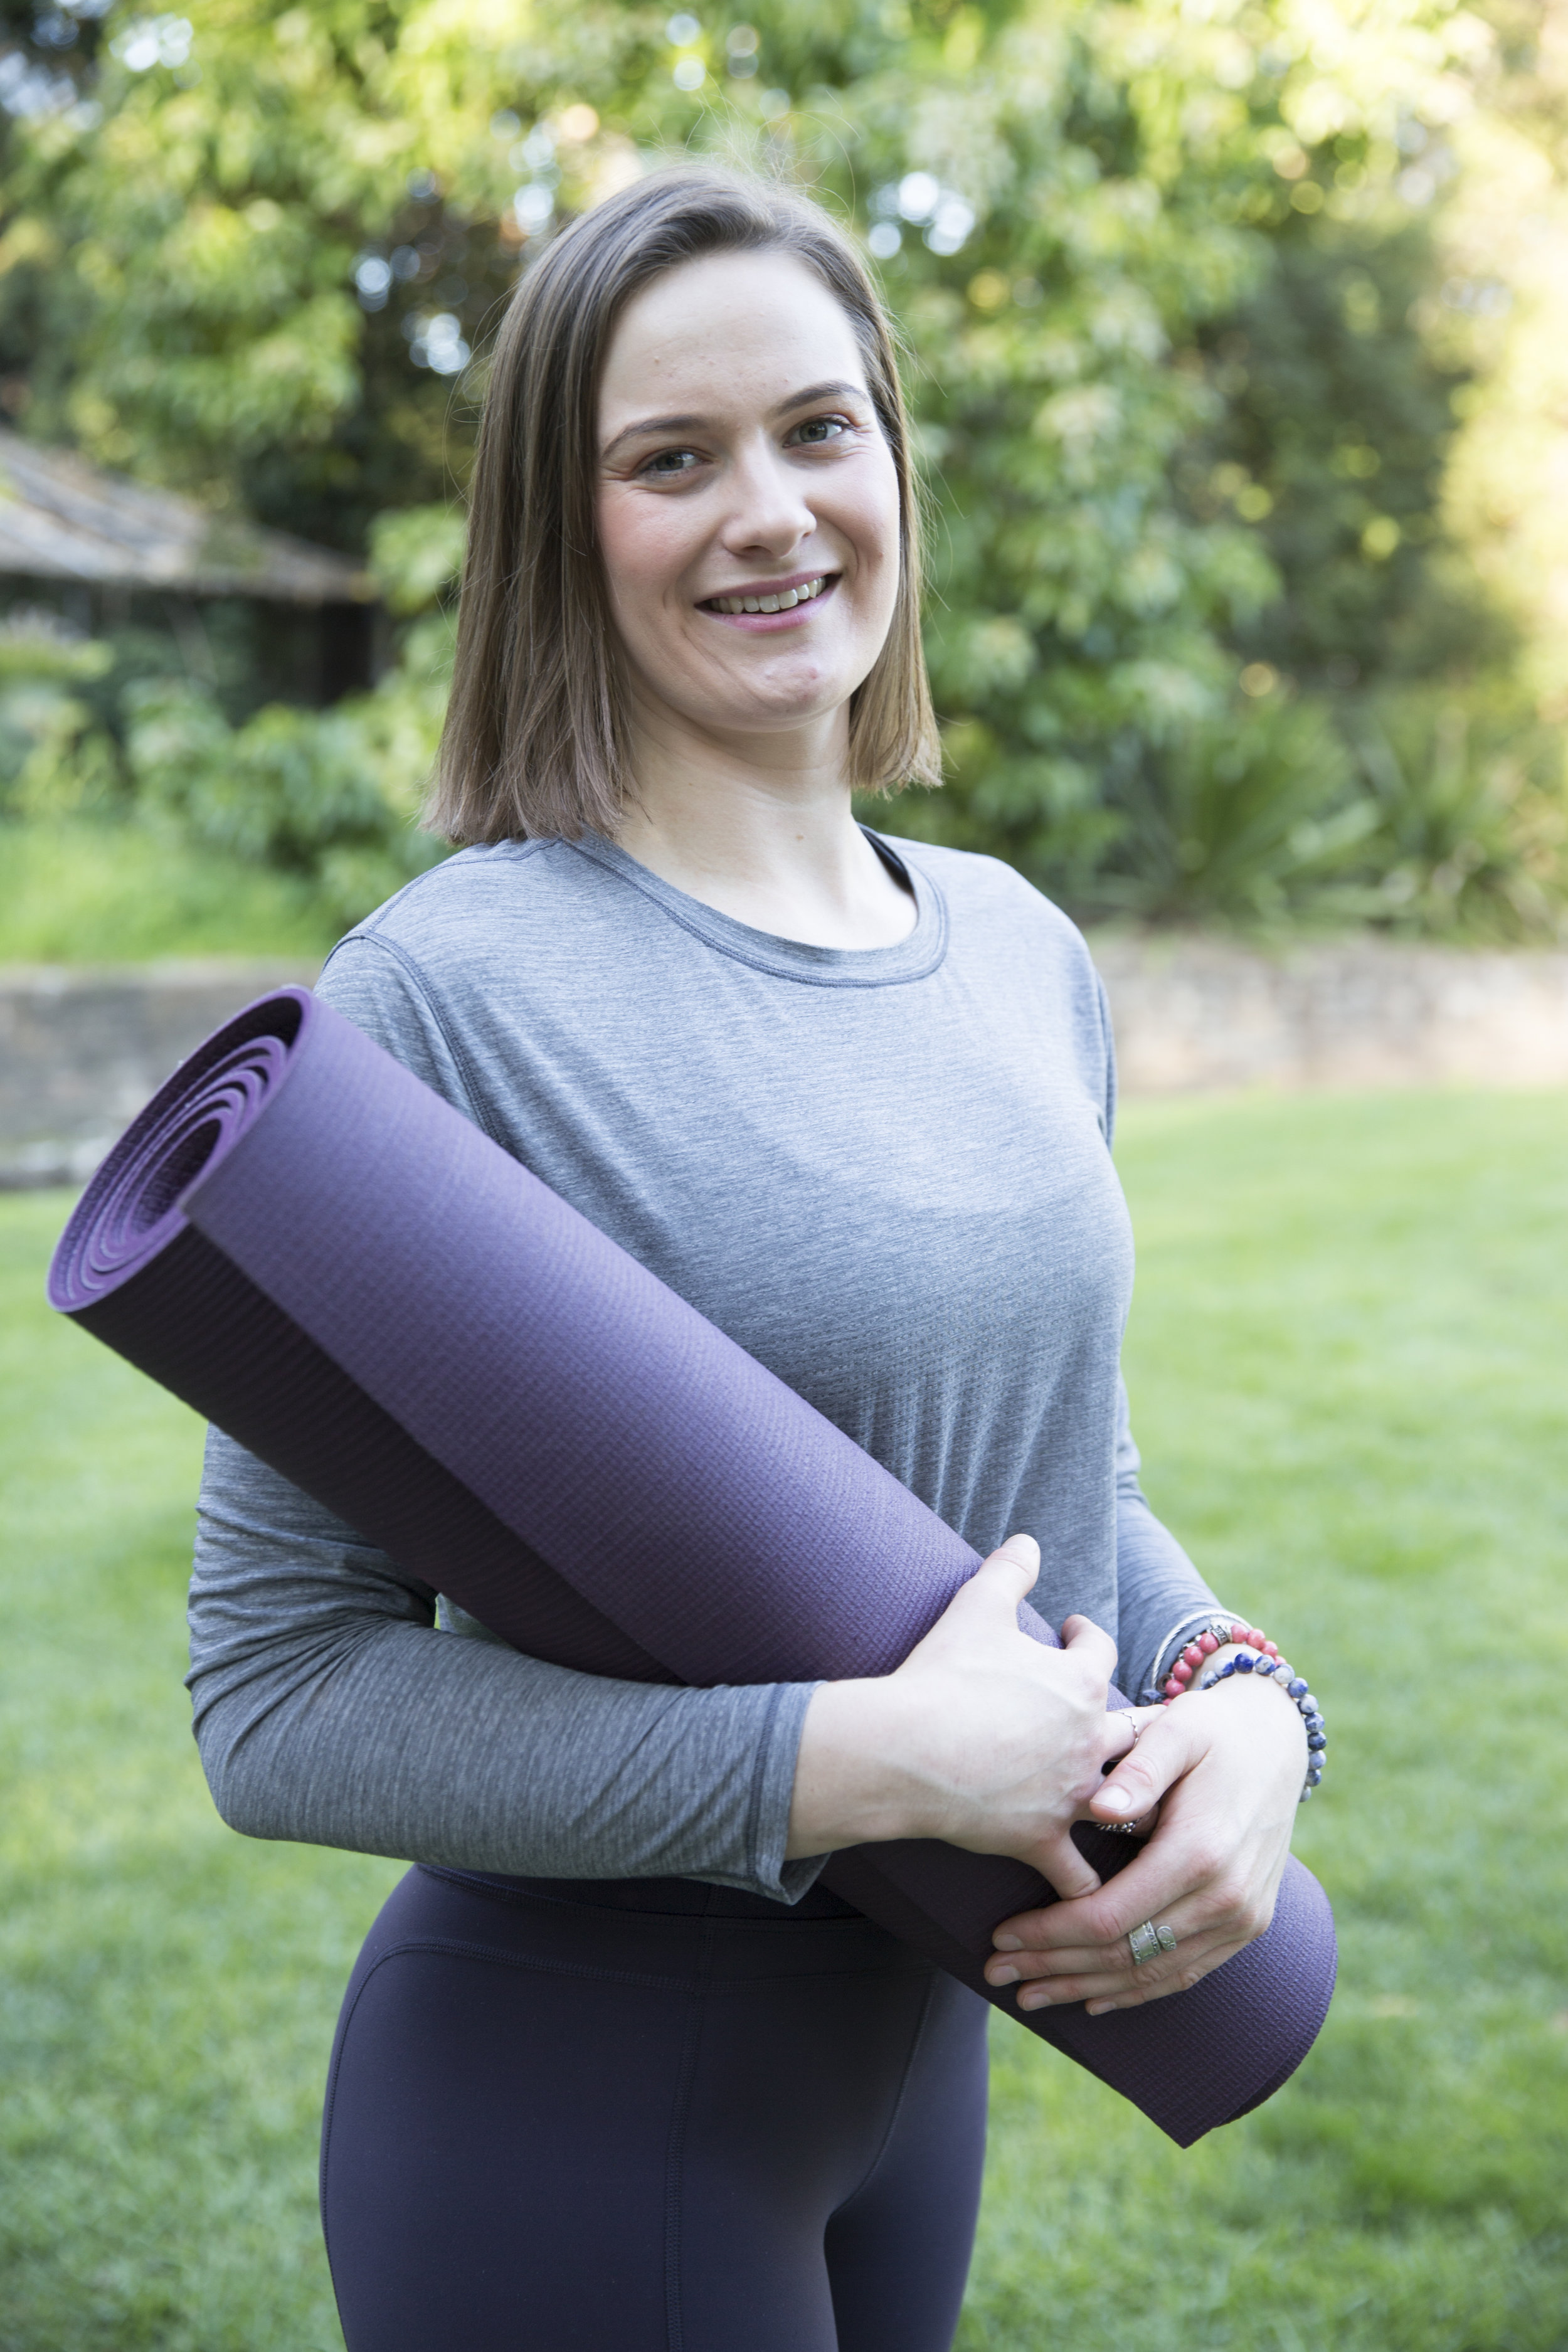 Yoga Teacher doTERRA Wellness Advocate Adelaide Australia